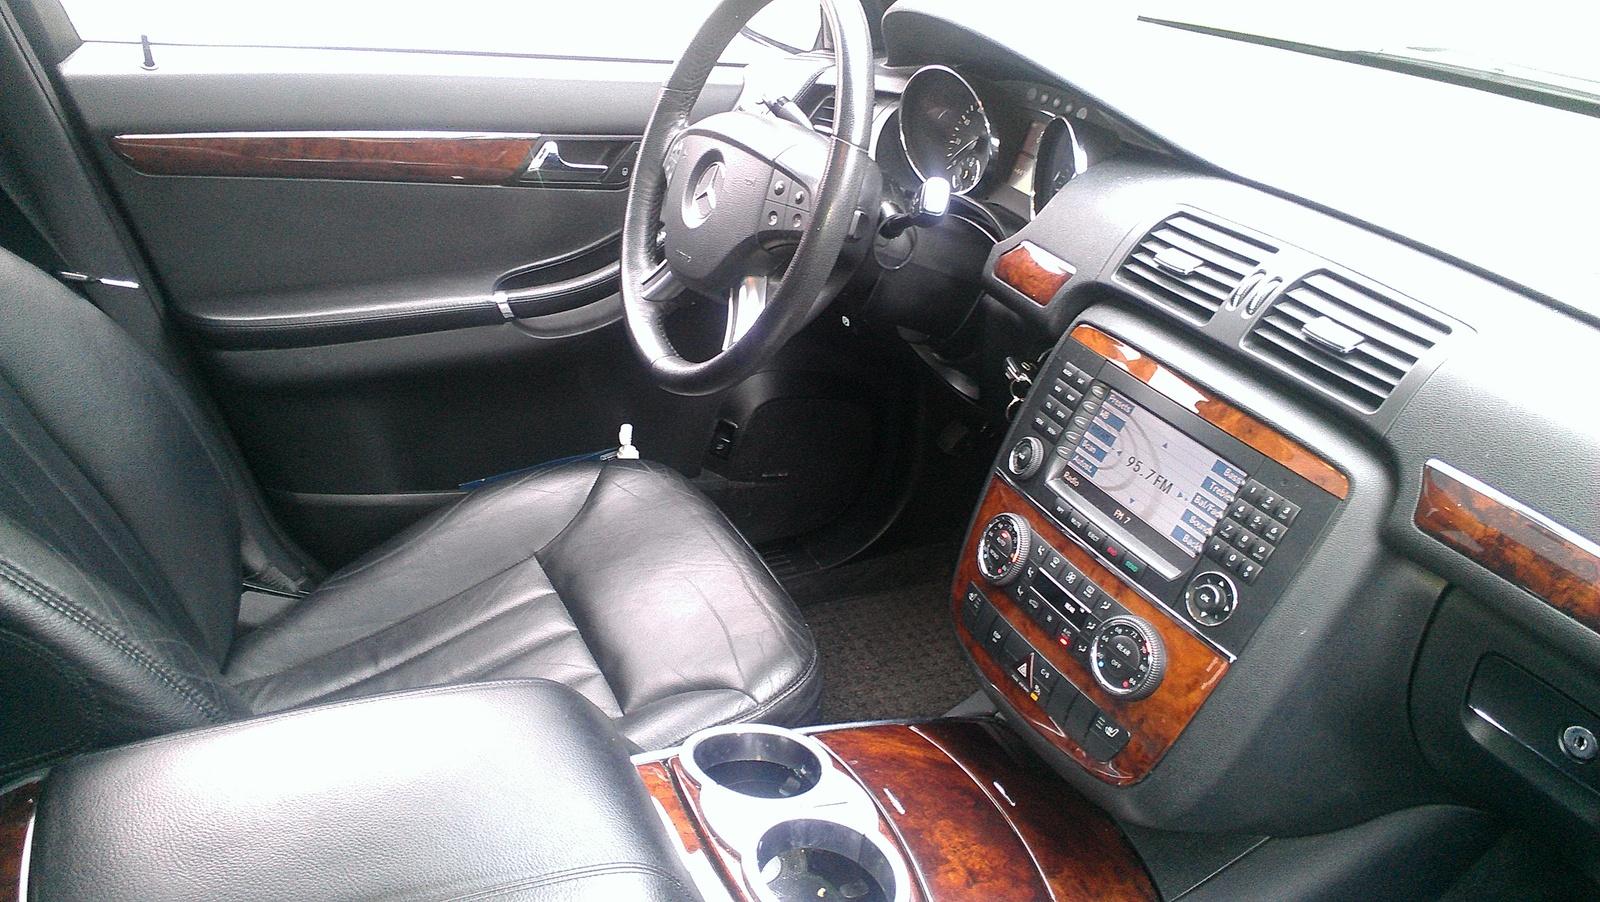 2006 mercedes benz r class interior pictures cargurus for 2006 mercedes benz r350 4matic